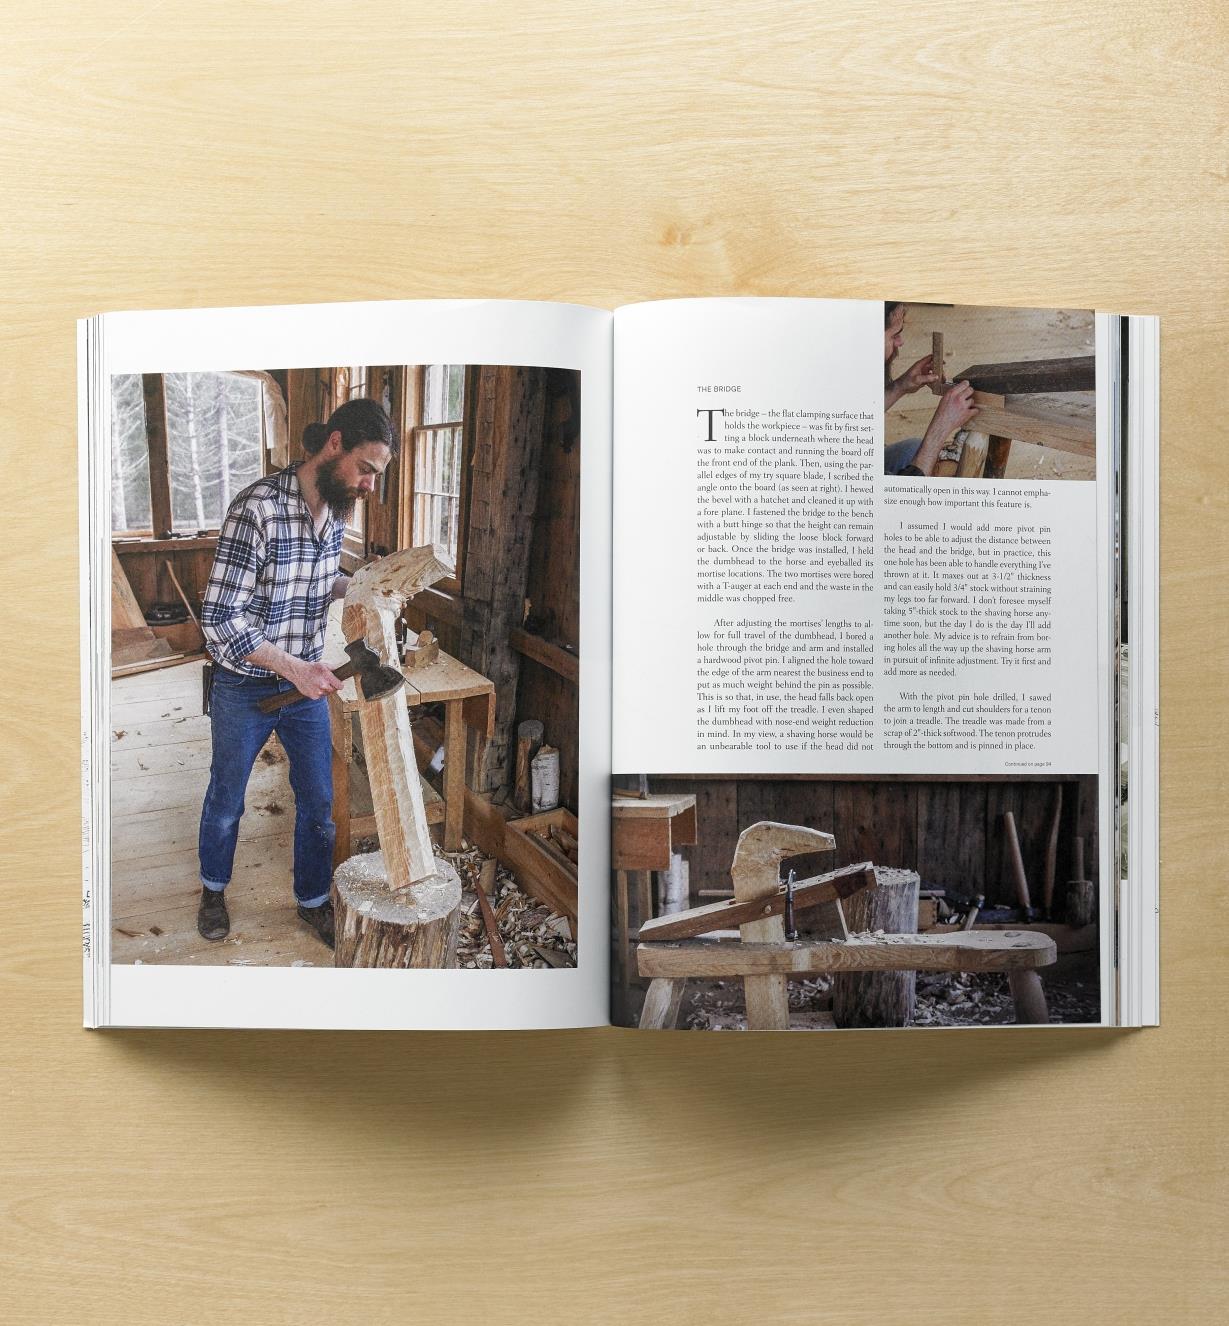 42L9519 - Mortise & Tenon Magazine, Issue 9